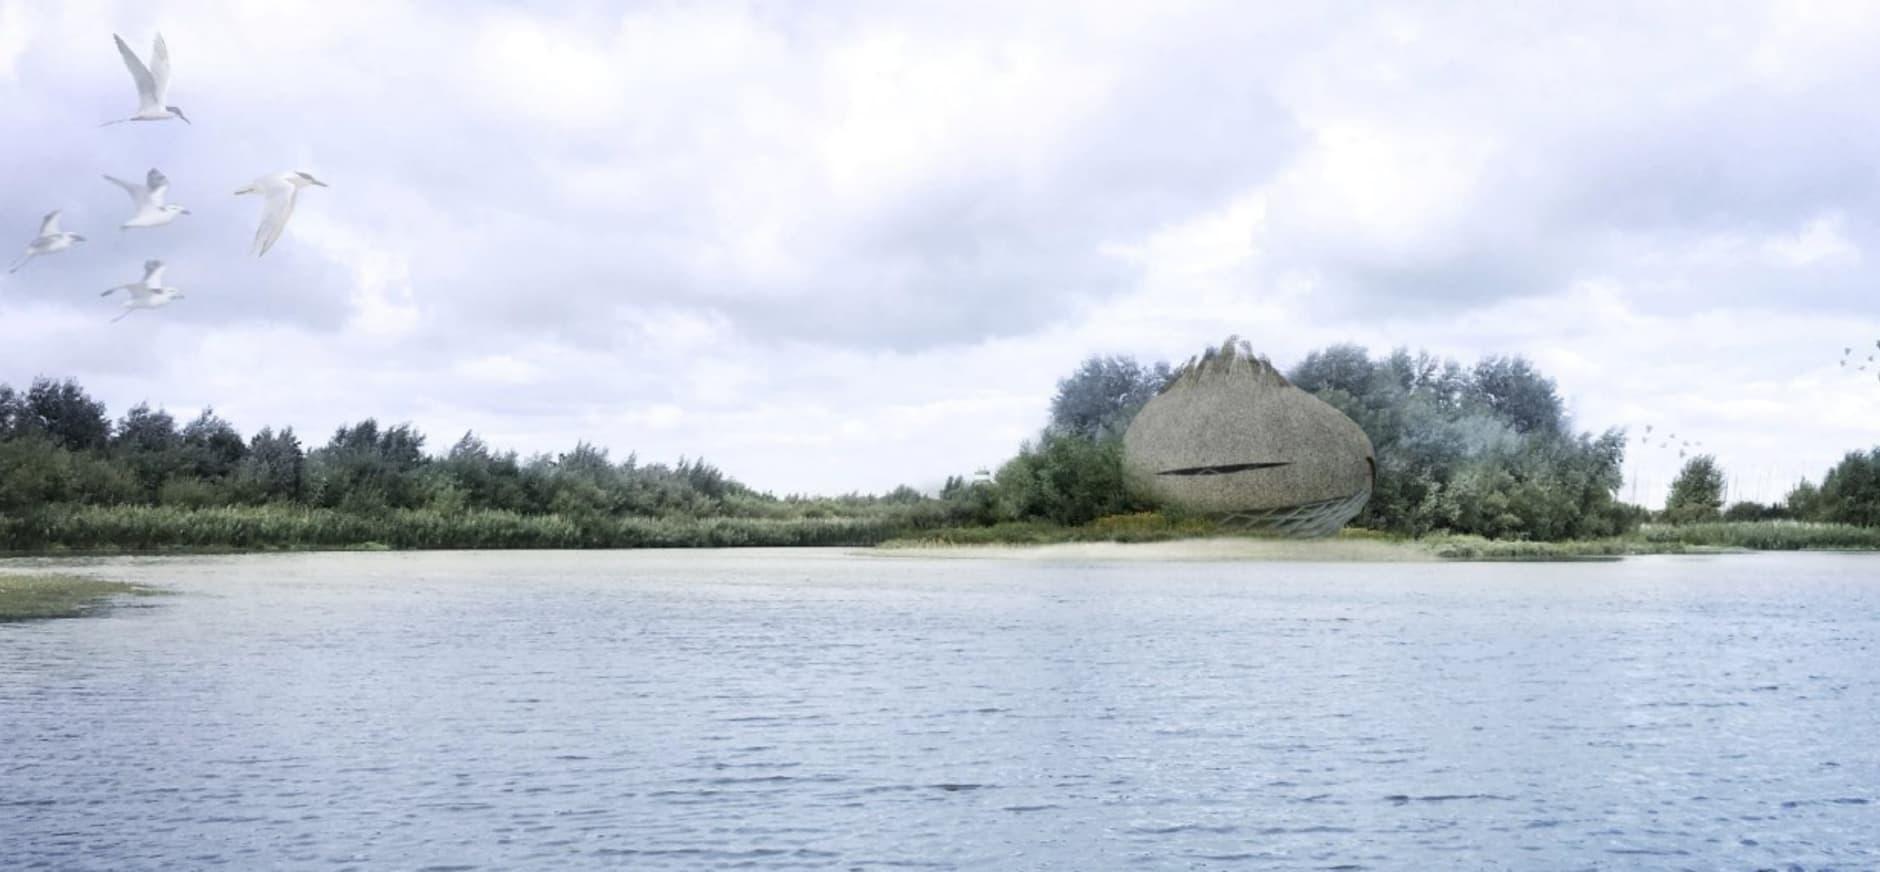 vogelobservatorium Scheelhoek